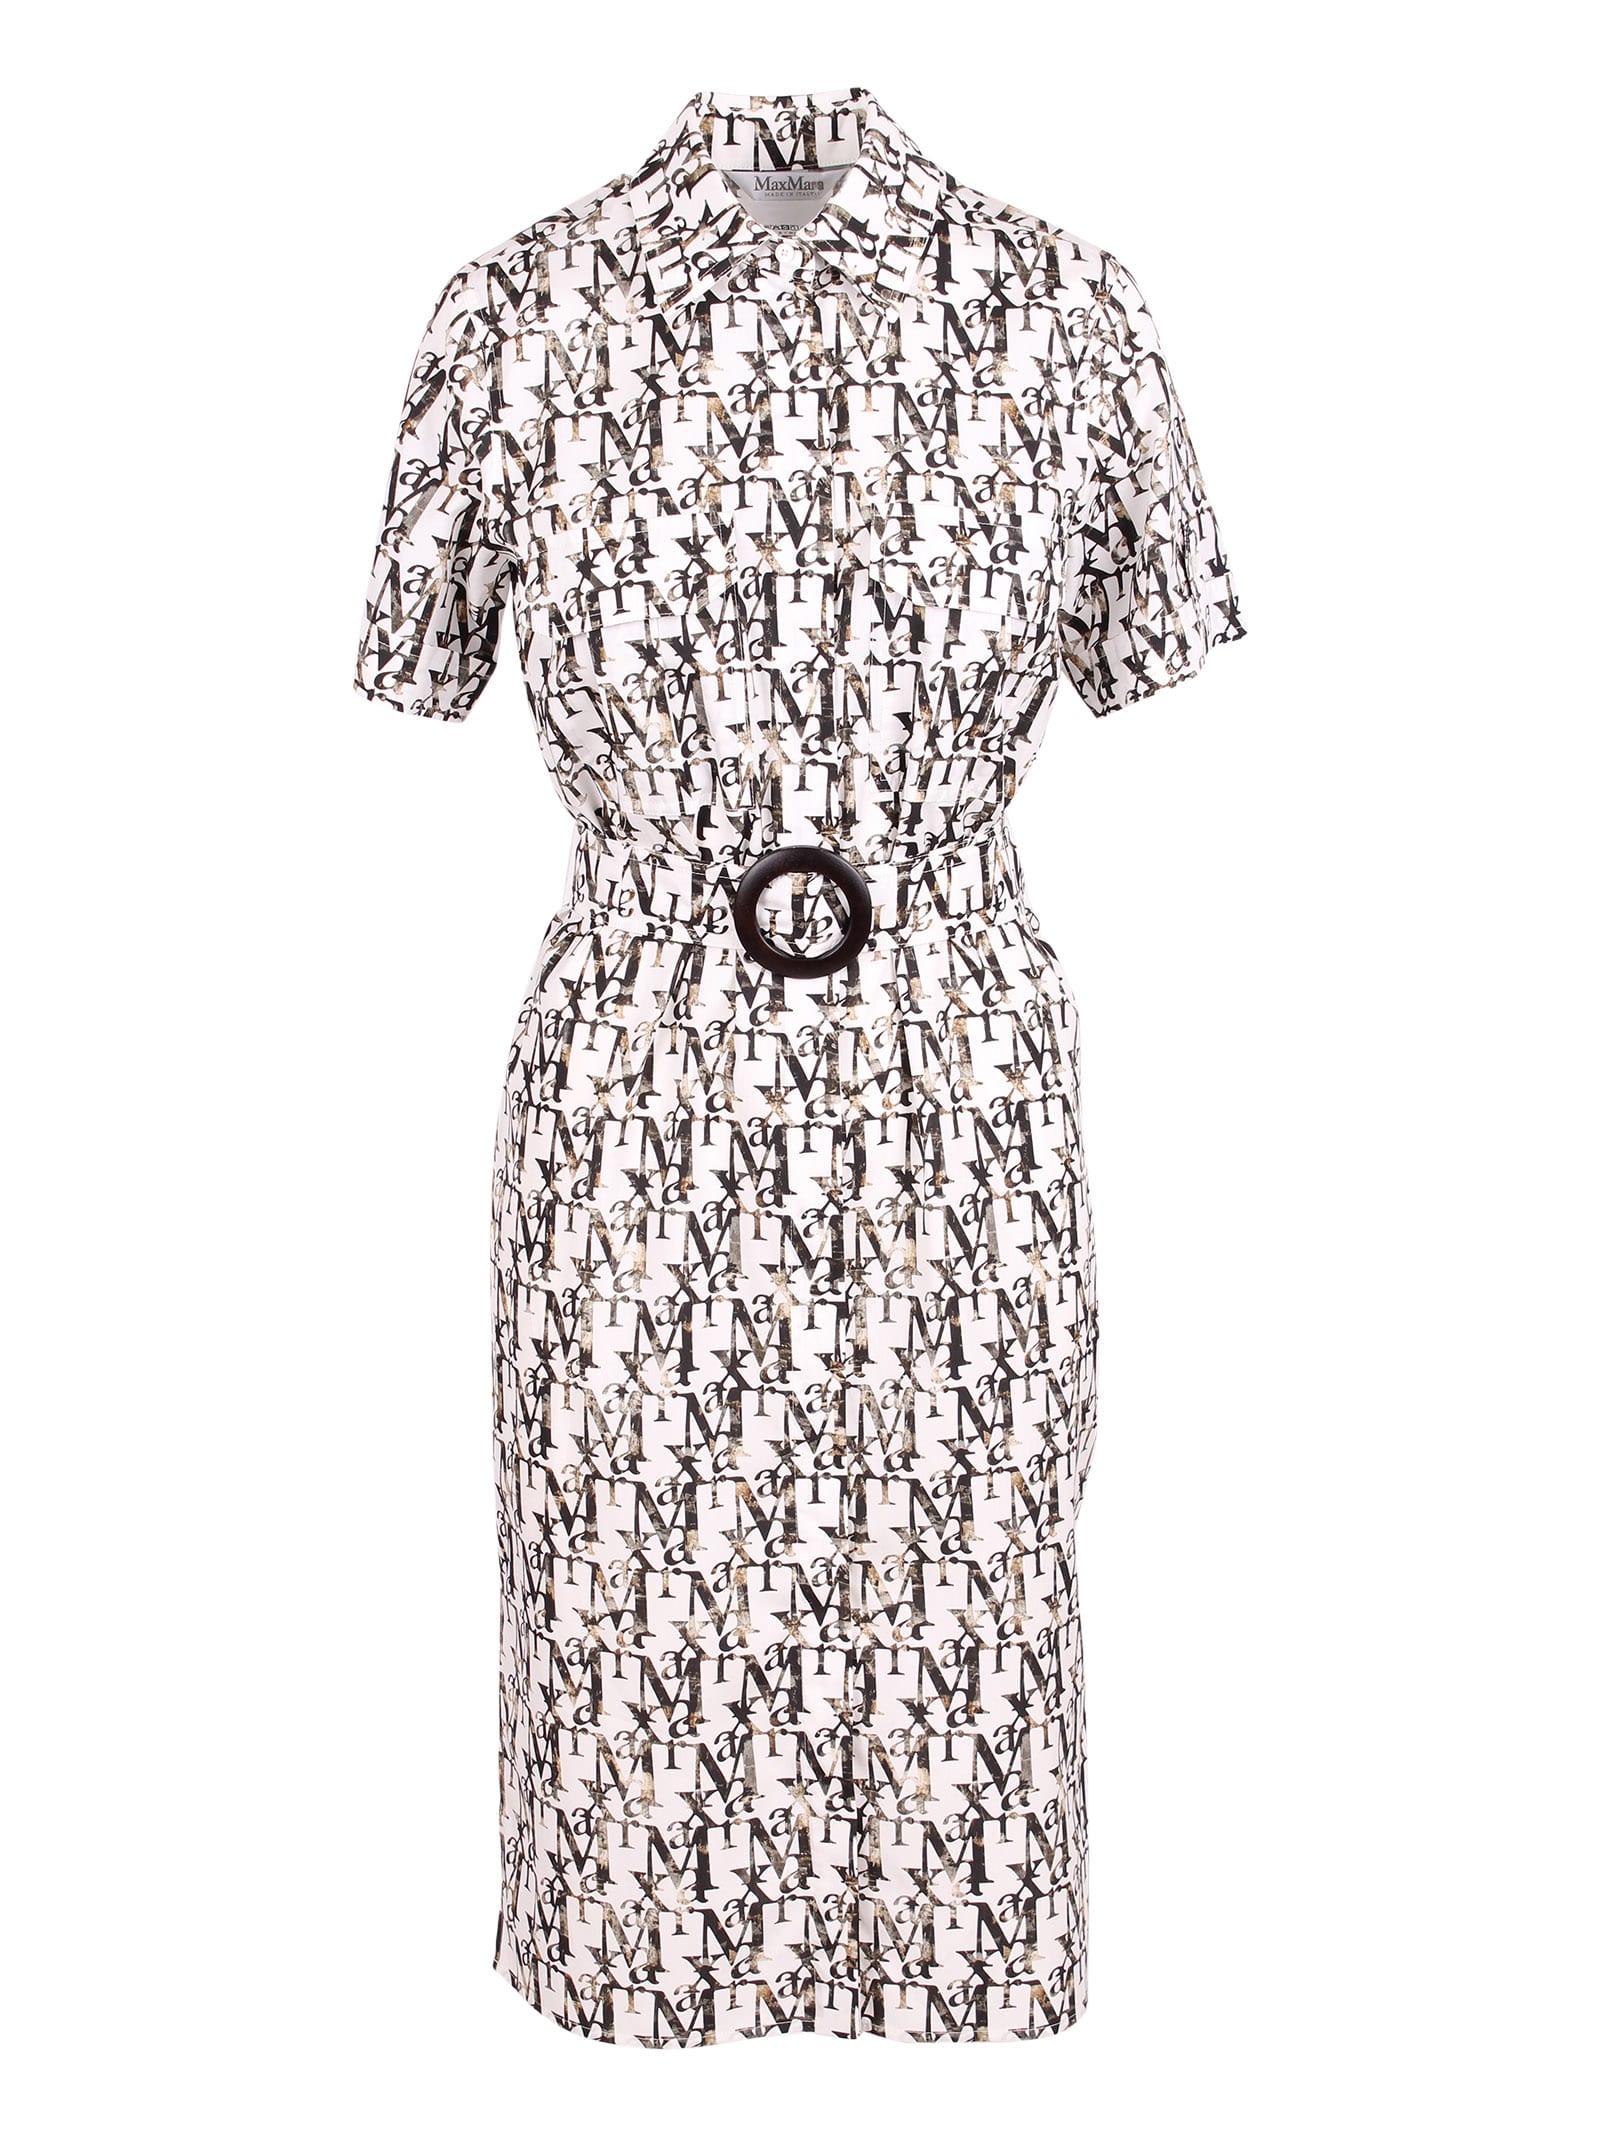 Max Mara fumana Cotton Dress